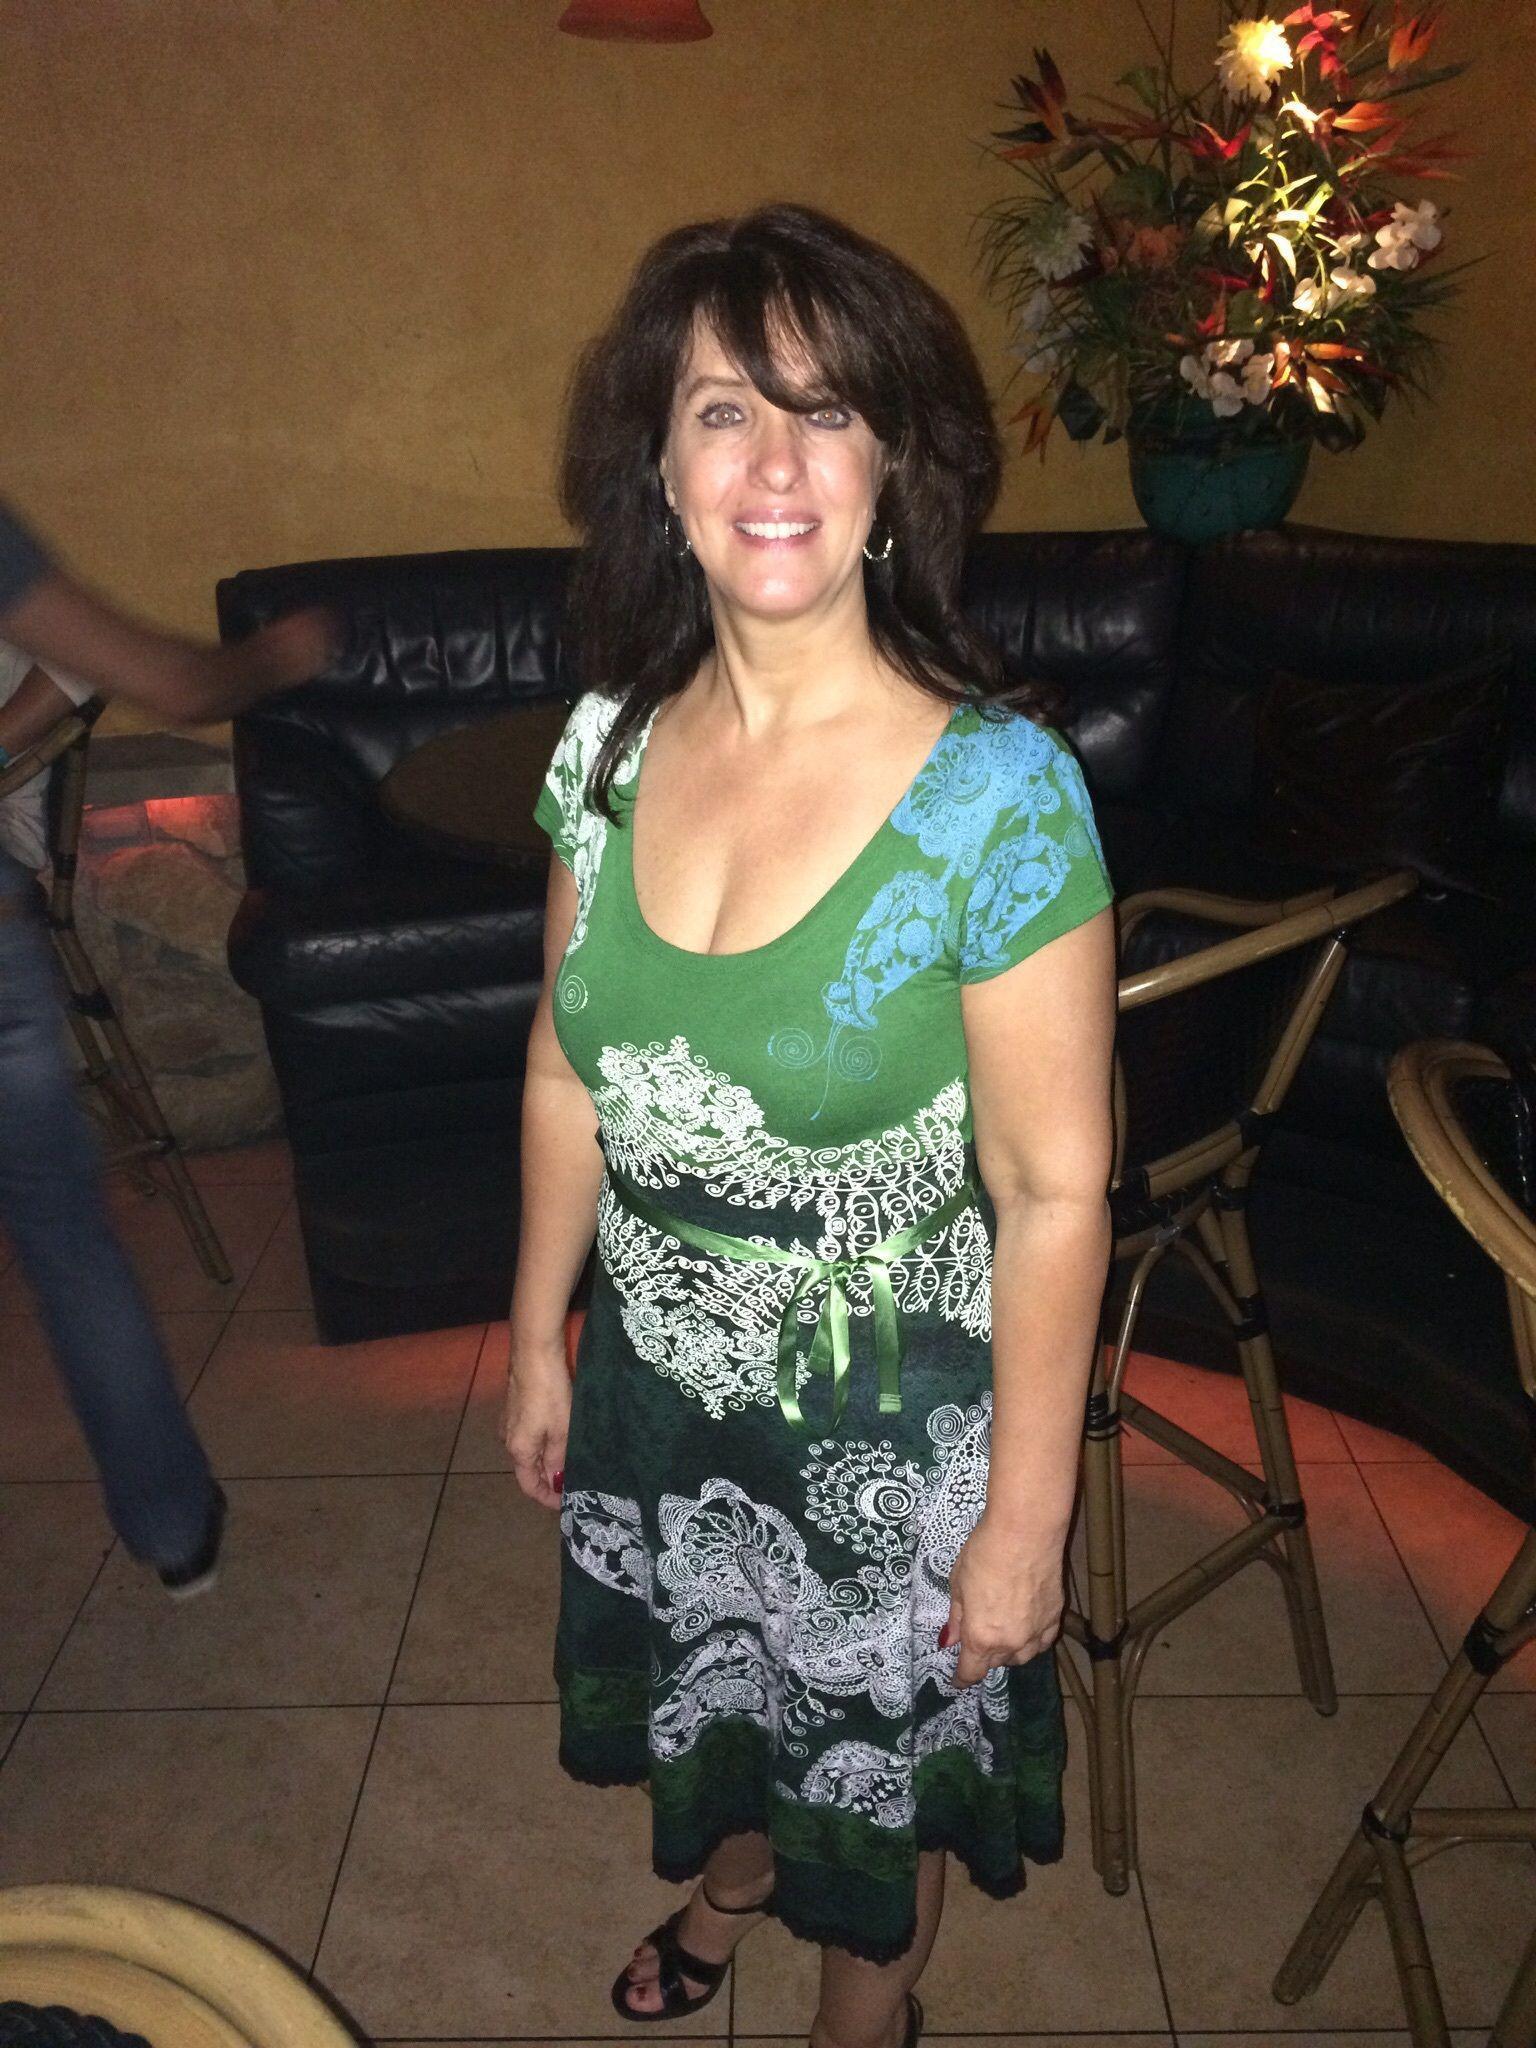 Renee tyree chicago dating sites